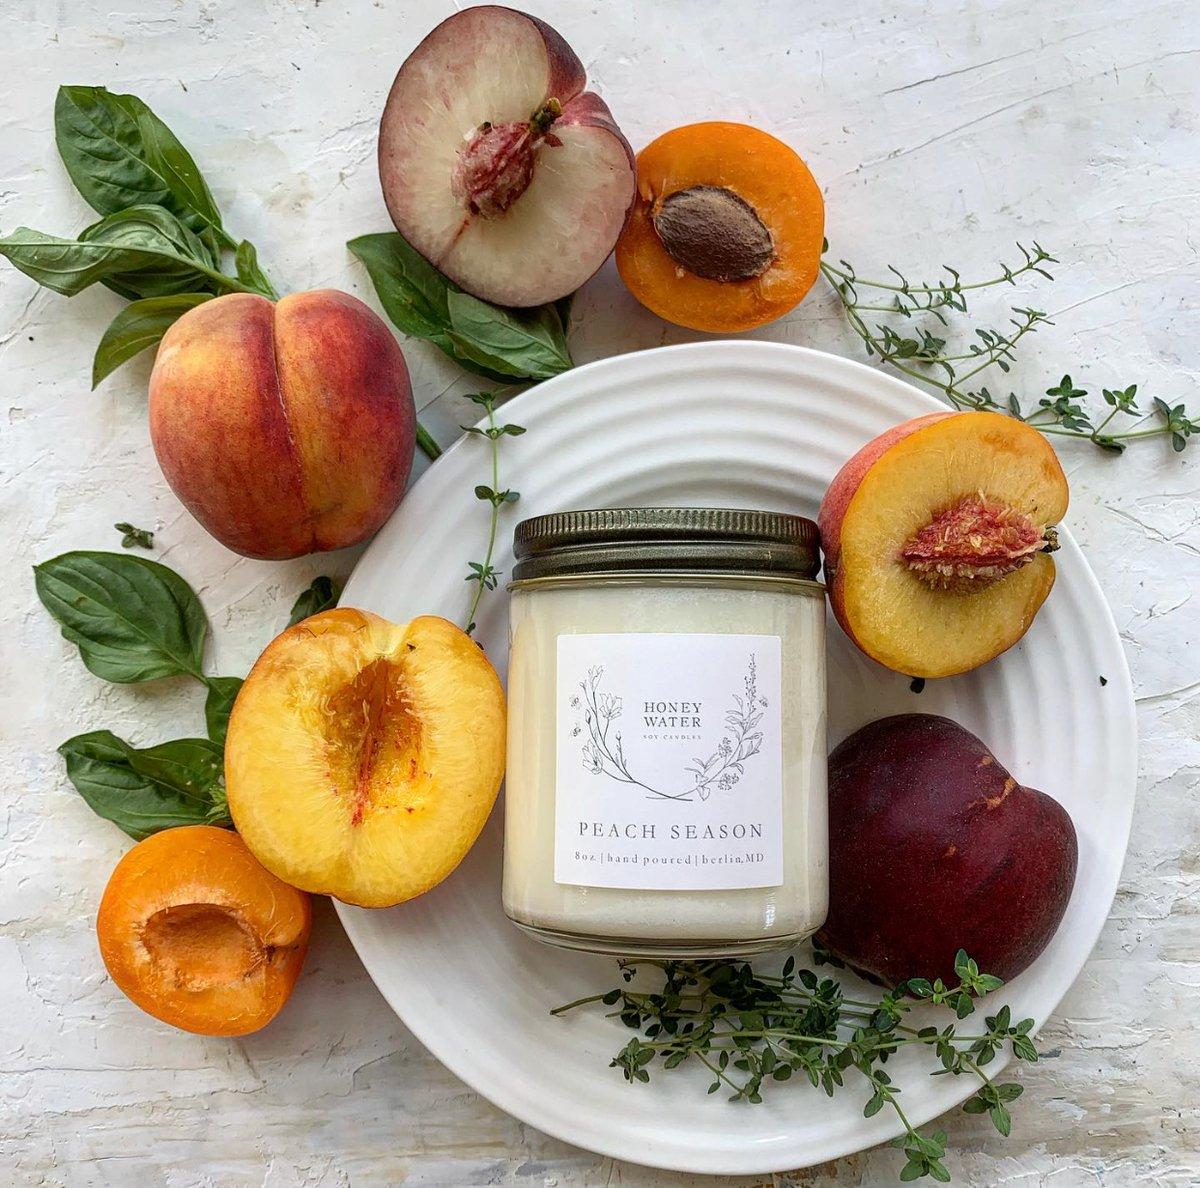 Image of Peach Season